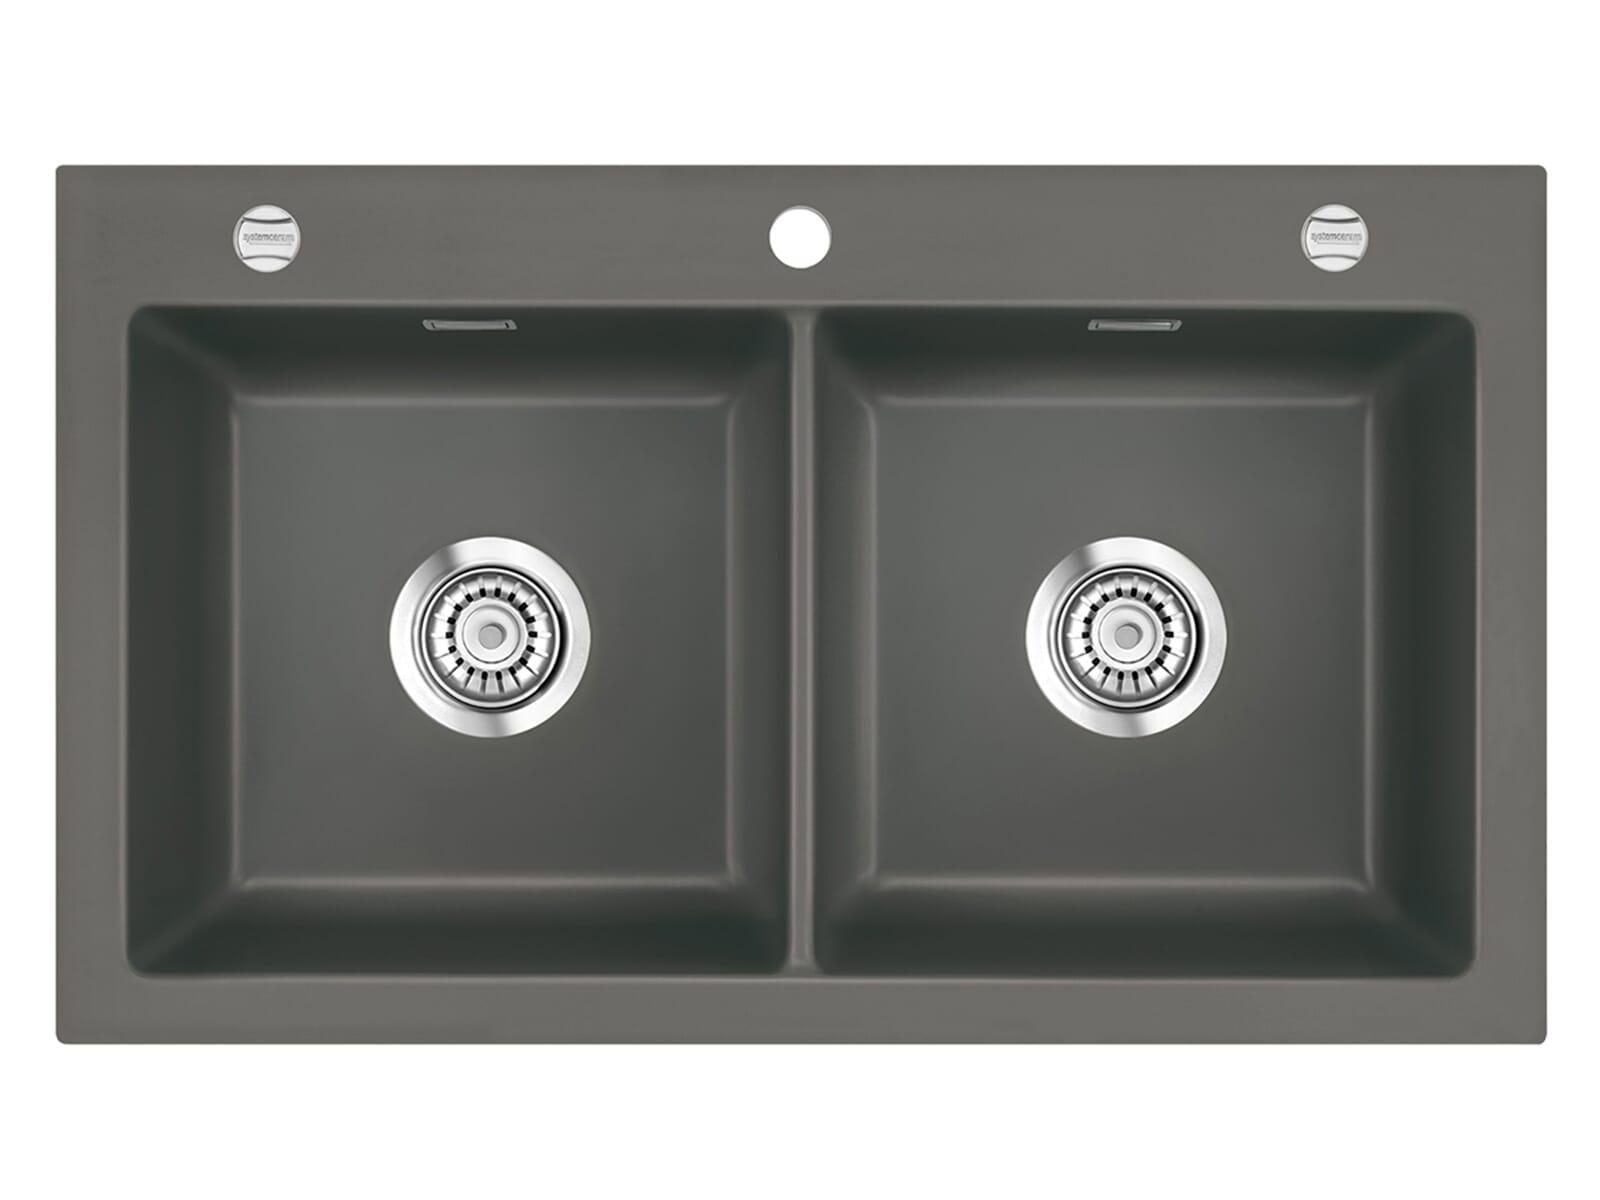 Systemceram Mera Twin Lava Keramikspüle Excenterbetätigung